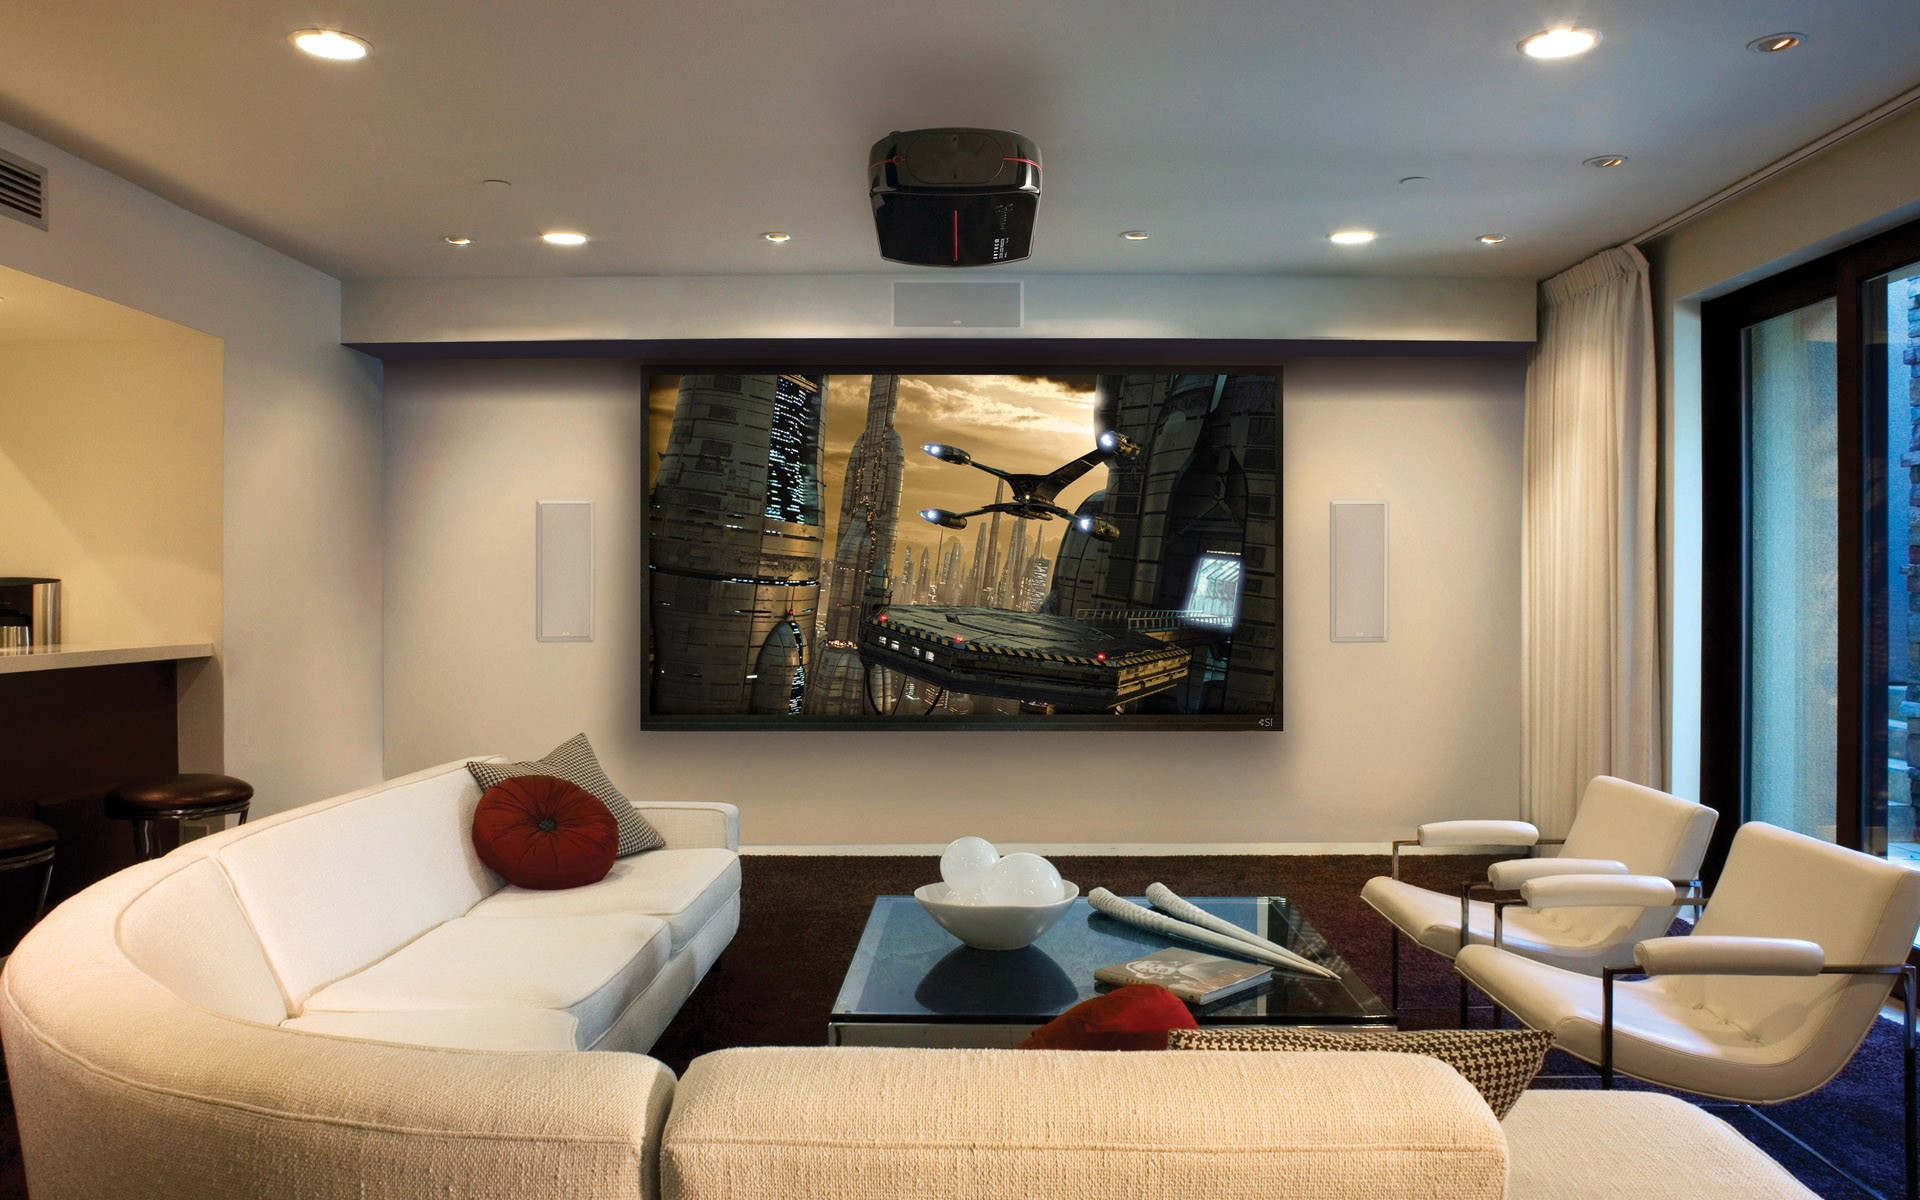 home-theater-interiors-impressive-design-ideas-home-theater-interiors-just-fea